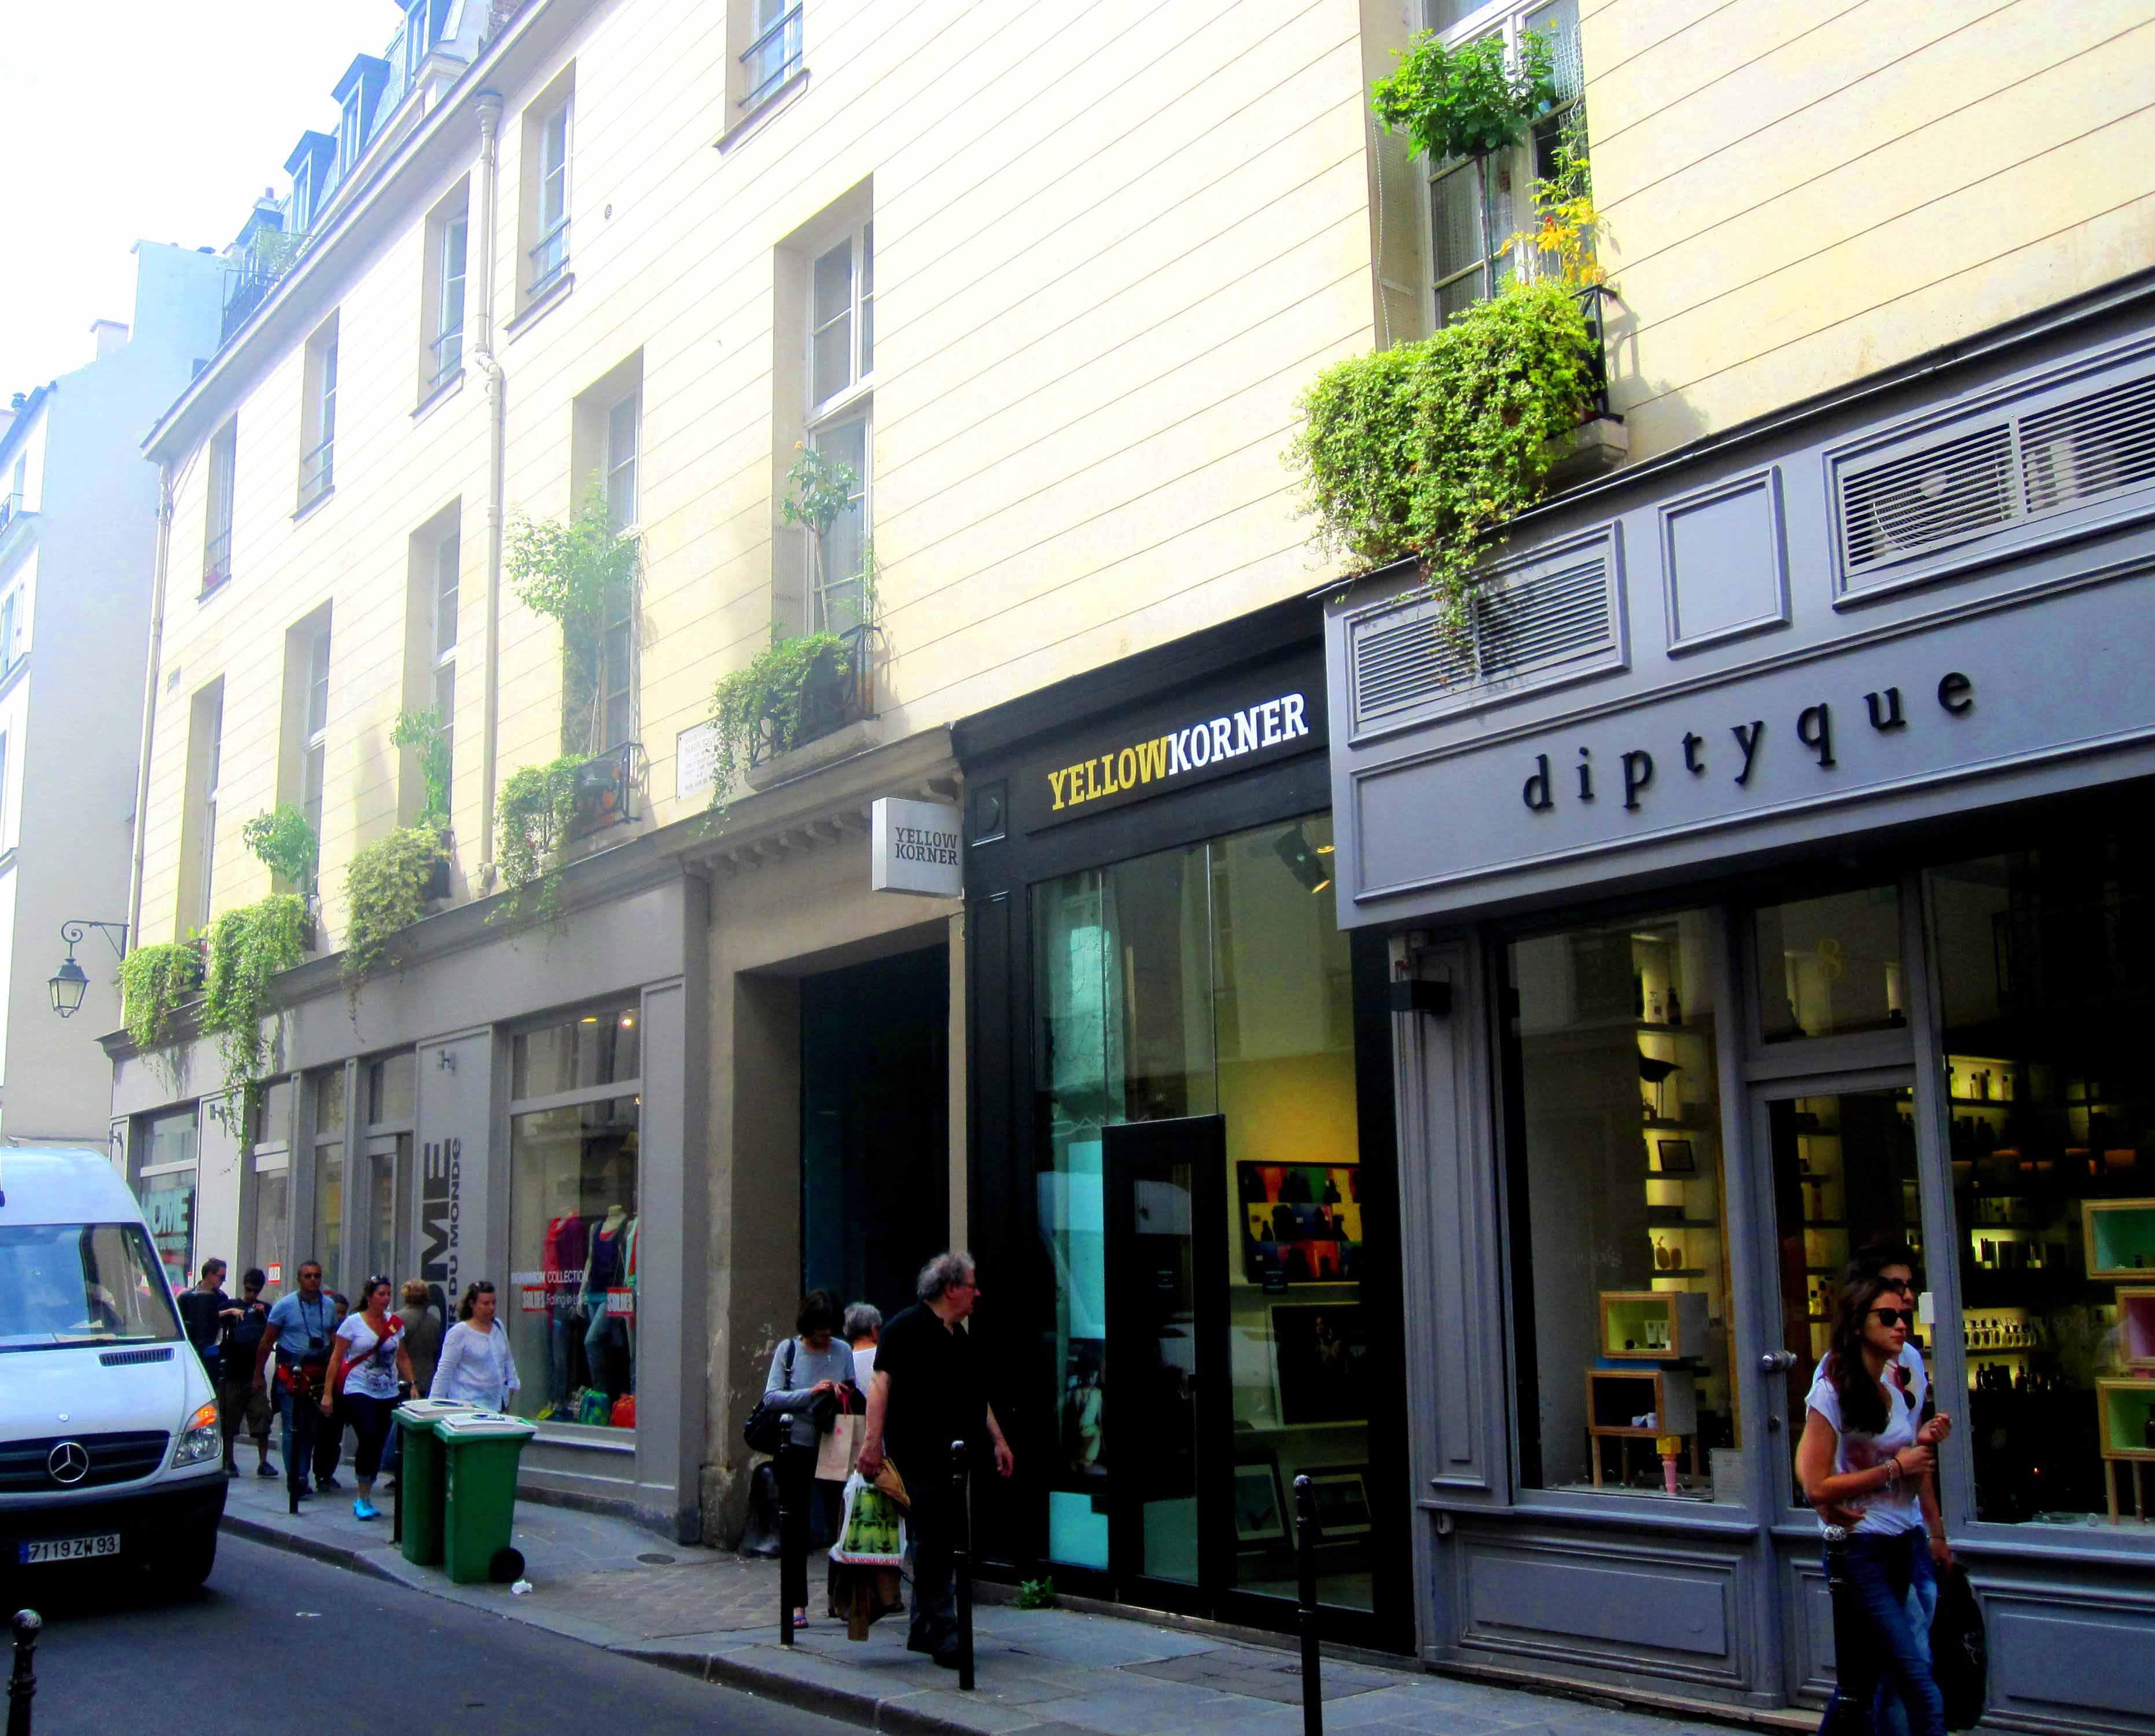 Yellowkorner Paris Francs Bourgeois mercerie – 8 rue des francs bourgeois, paris – pelicangroupe